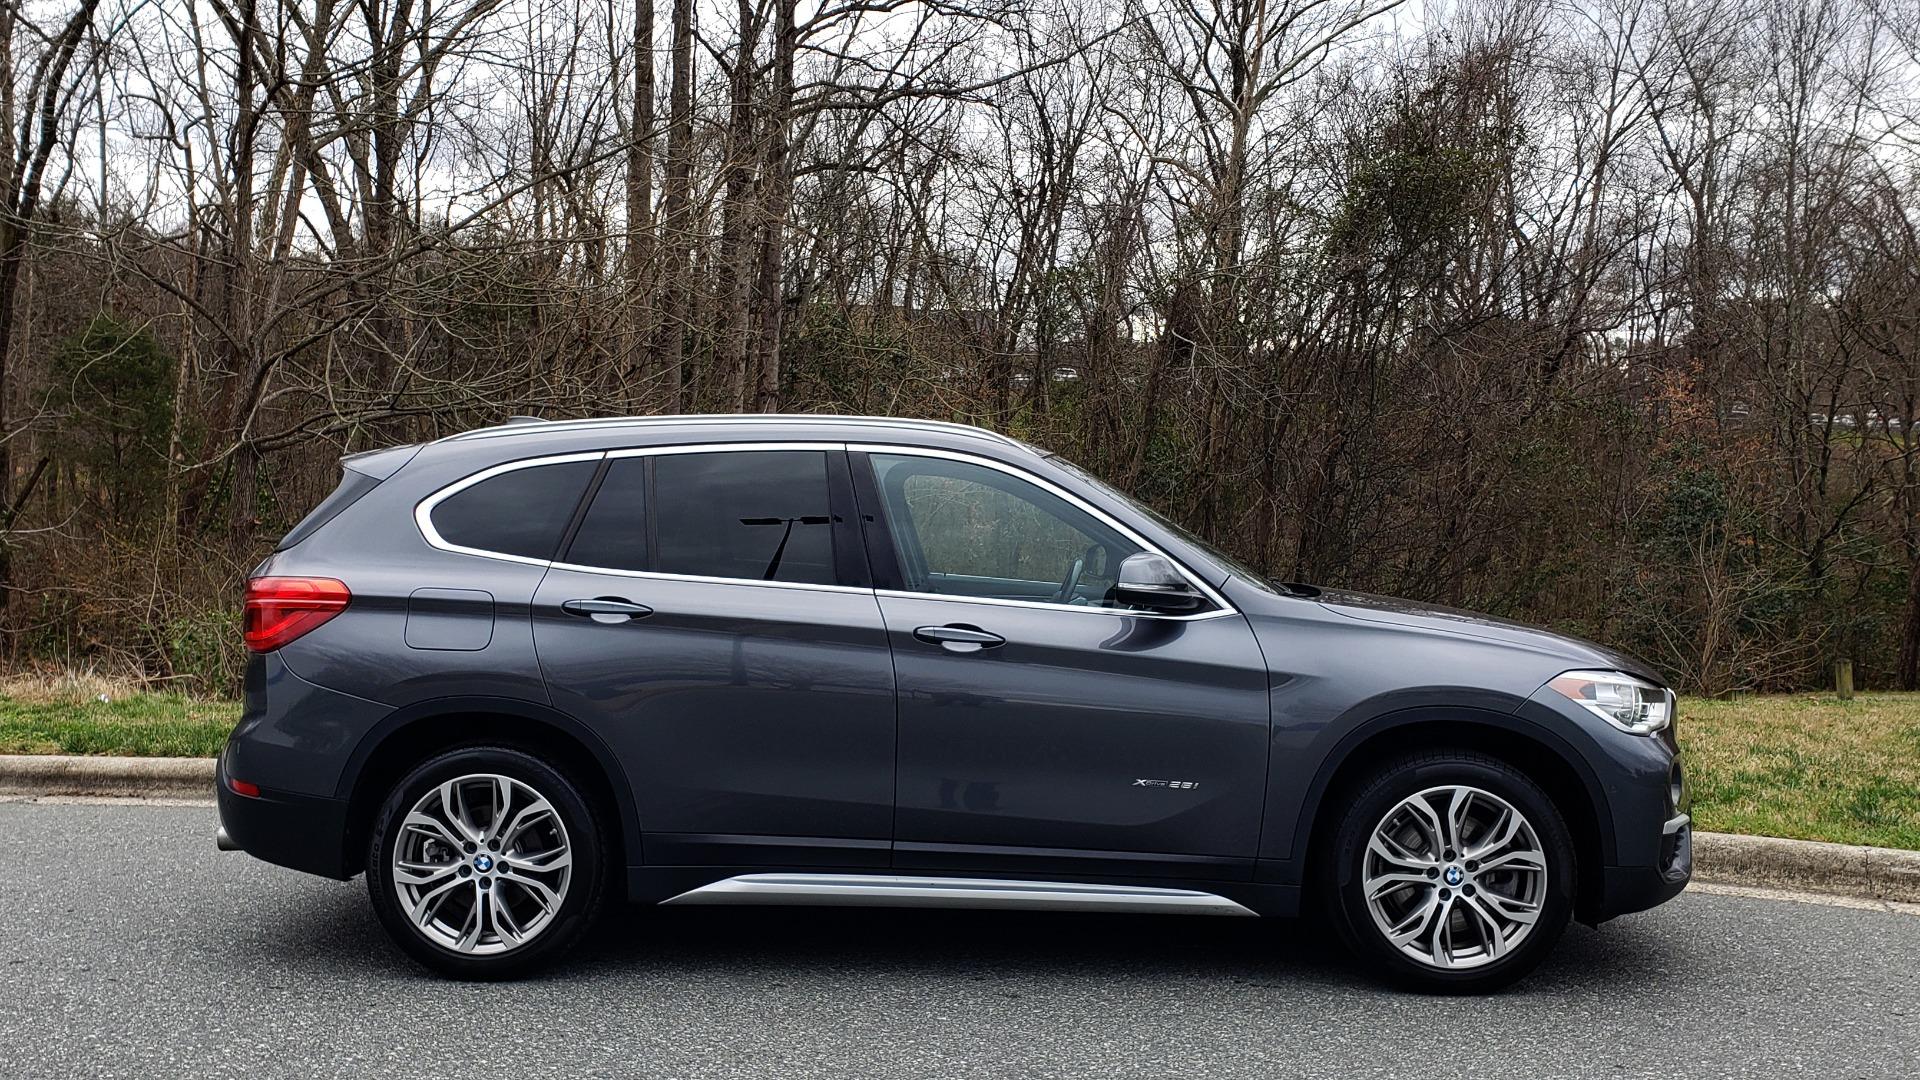 Used 2017 BMW X1 XDRIVE28I / PREM PKG / DRIVER ASST / NAV / CLD WTHR for sale Sold at Formula Imports in Charlotte NC 28227 5